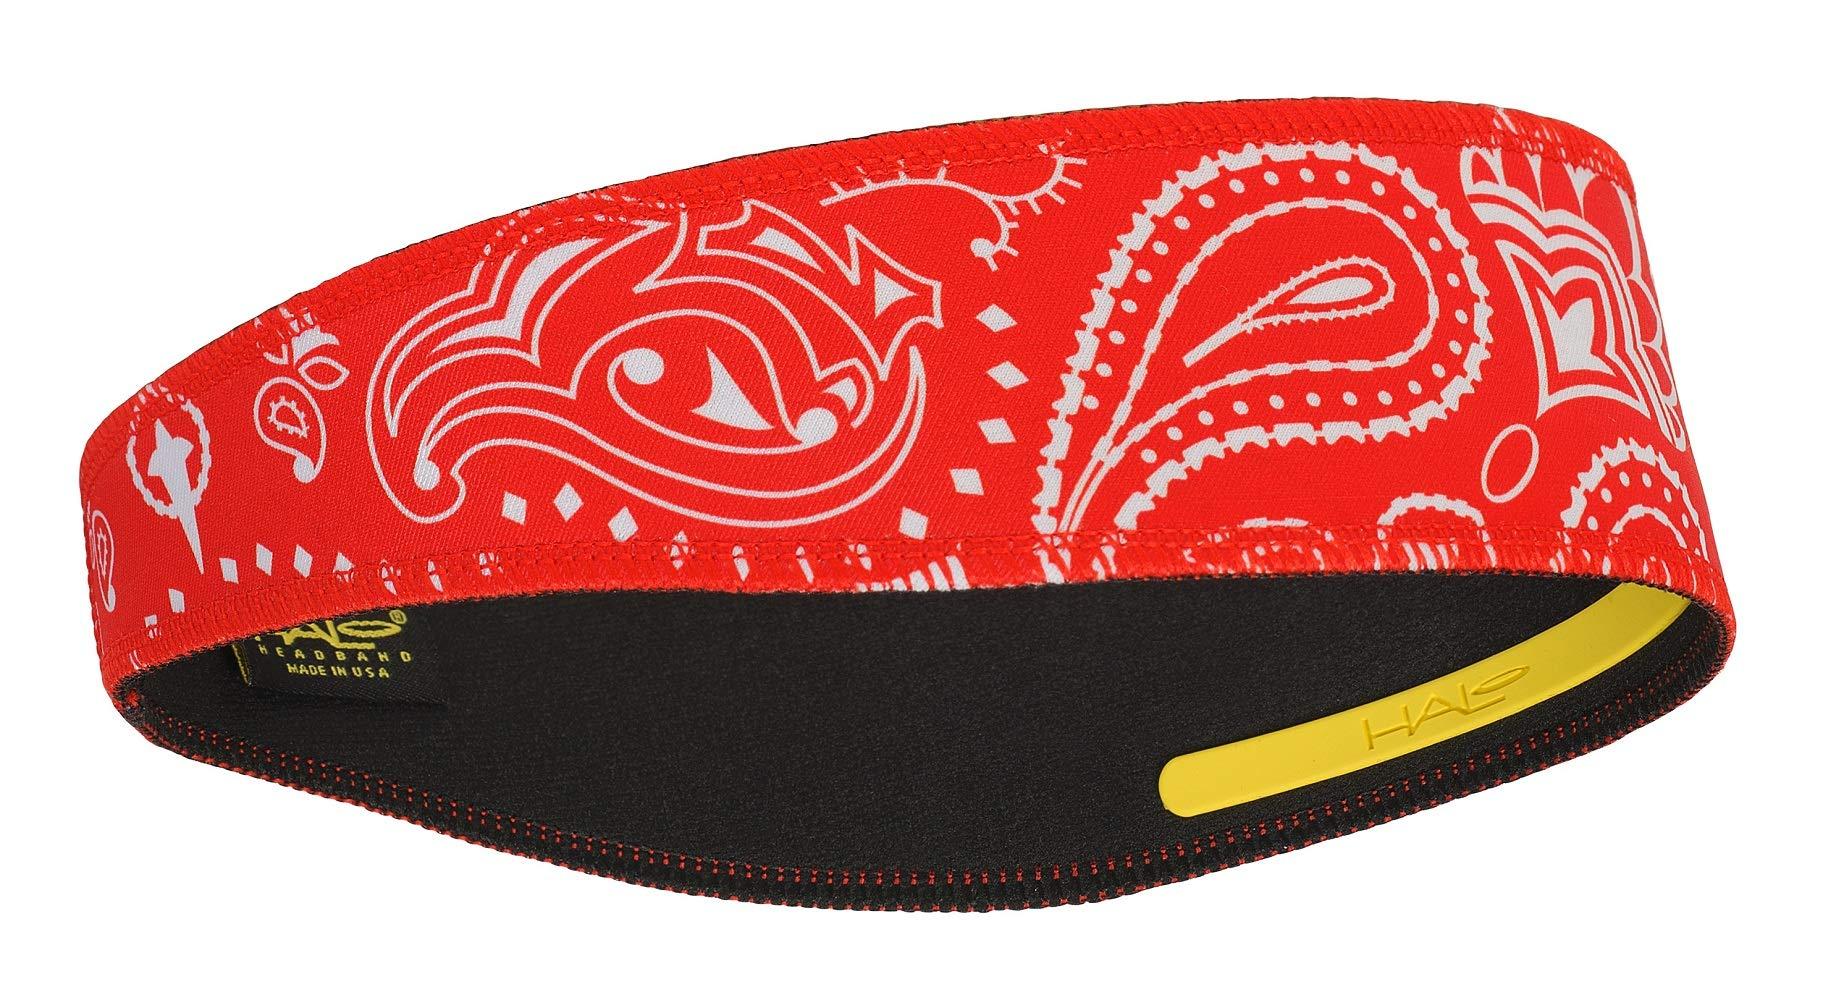 Halo II Headband Sweatband Pullover Paisley Red by Halo Headbands